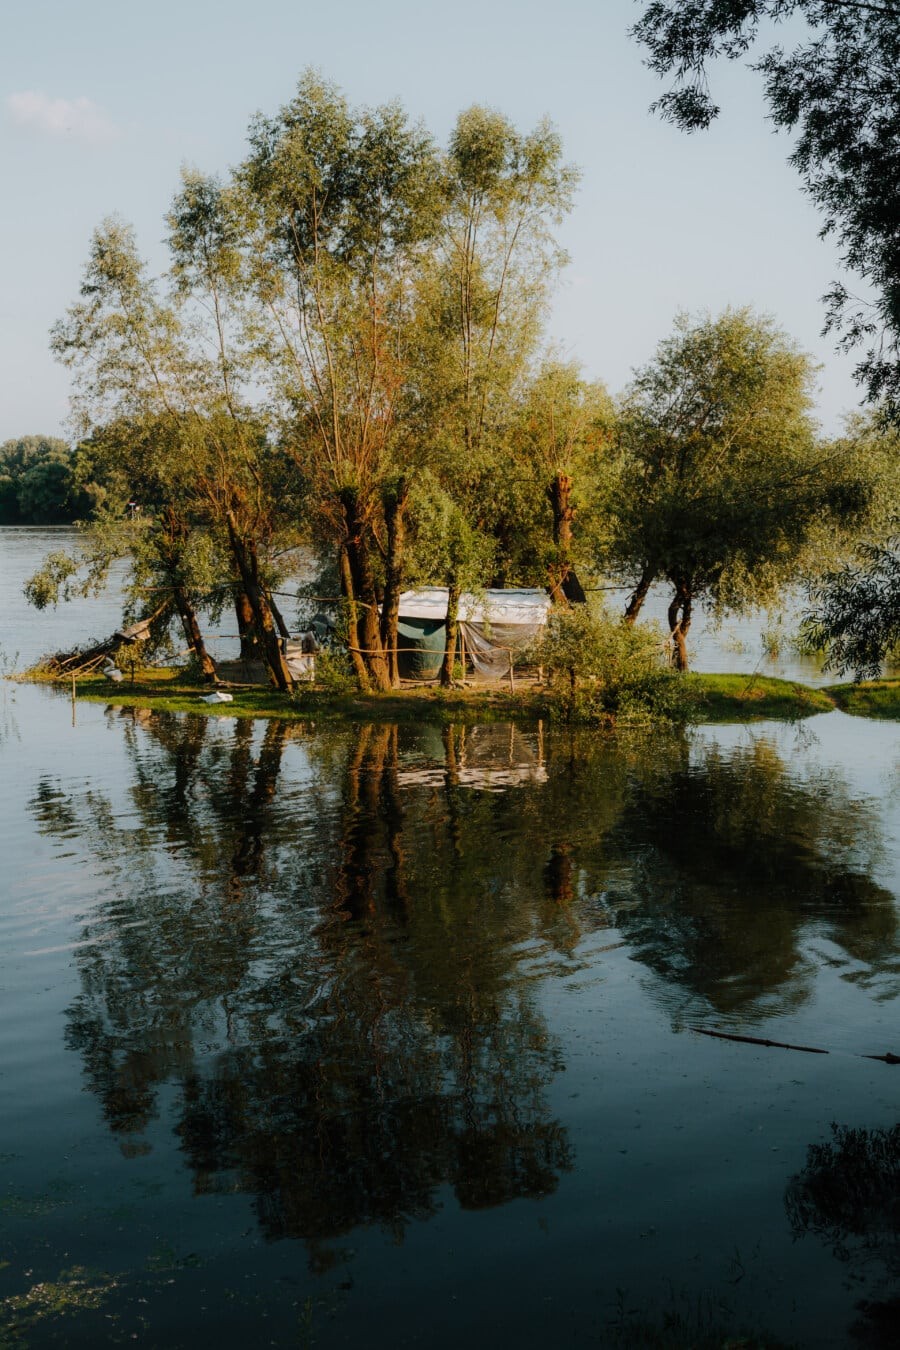 tent, camping, floodplain, flood, river, riverbank, lake, water, tree, landscape